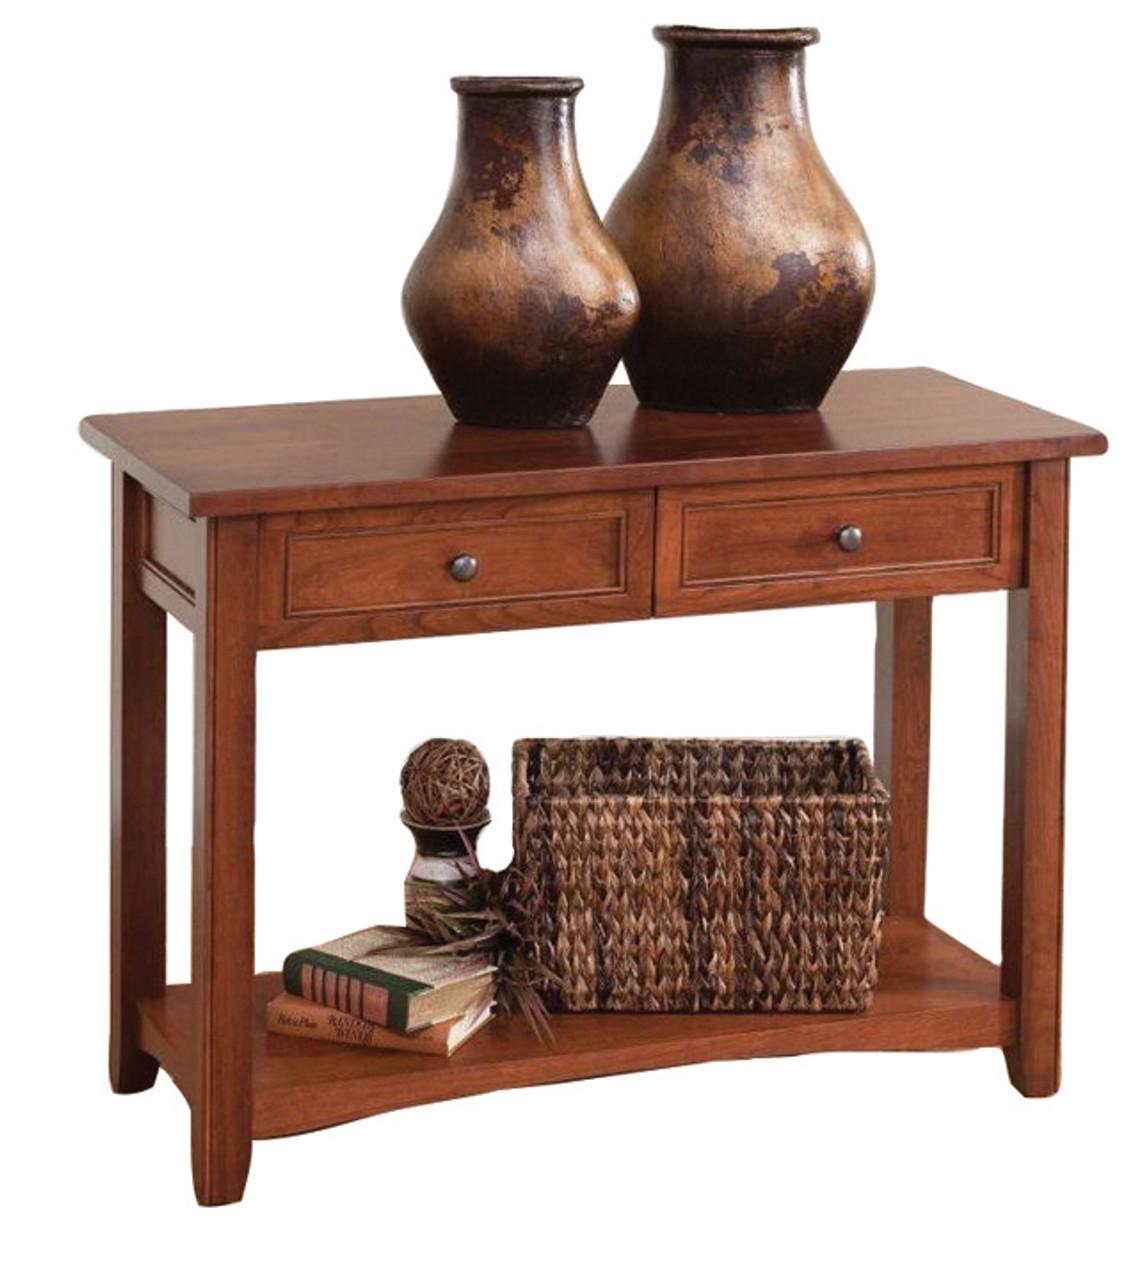 Enjoyable Hw Madison Sofa Table Ncnpc Chair Design For Home Ncnpcorg